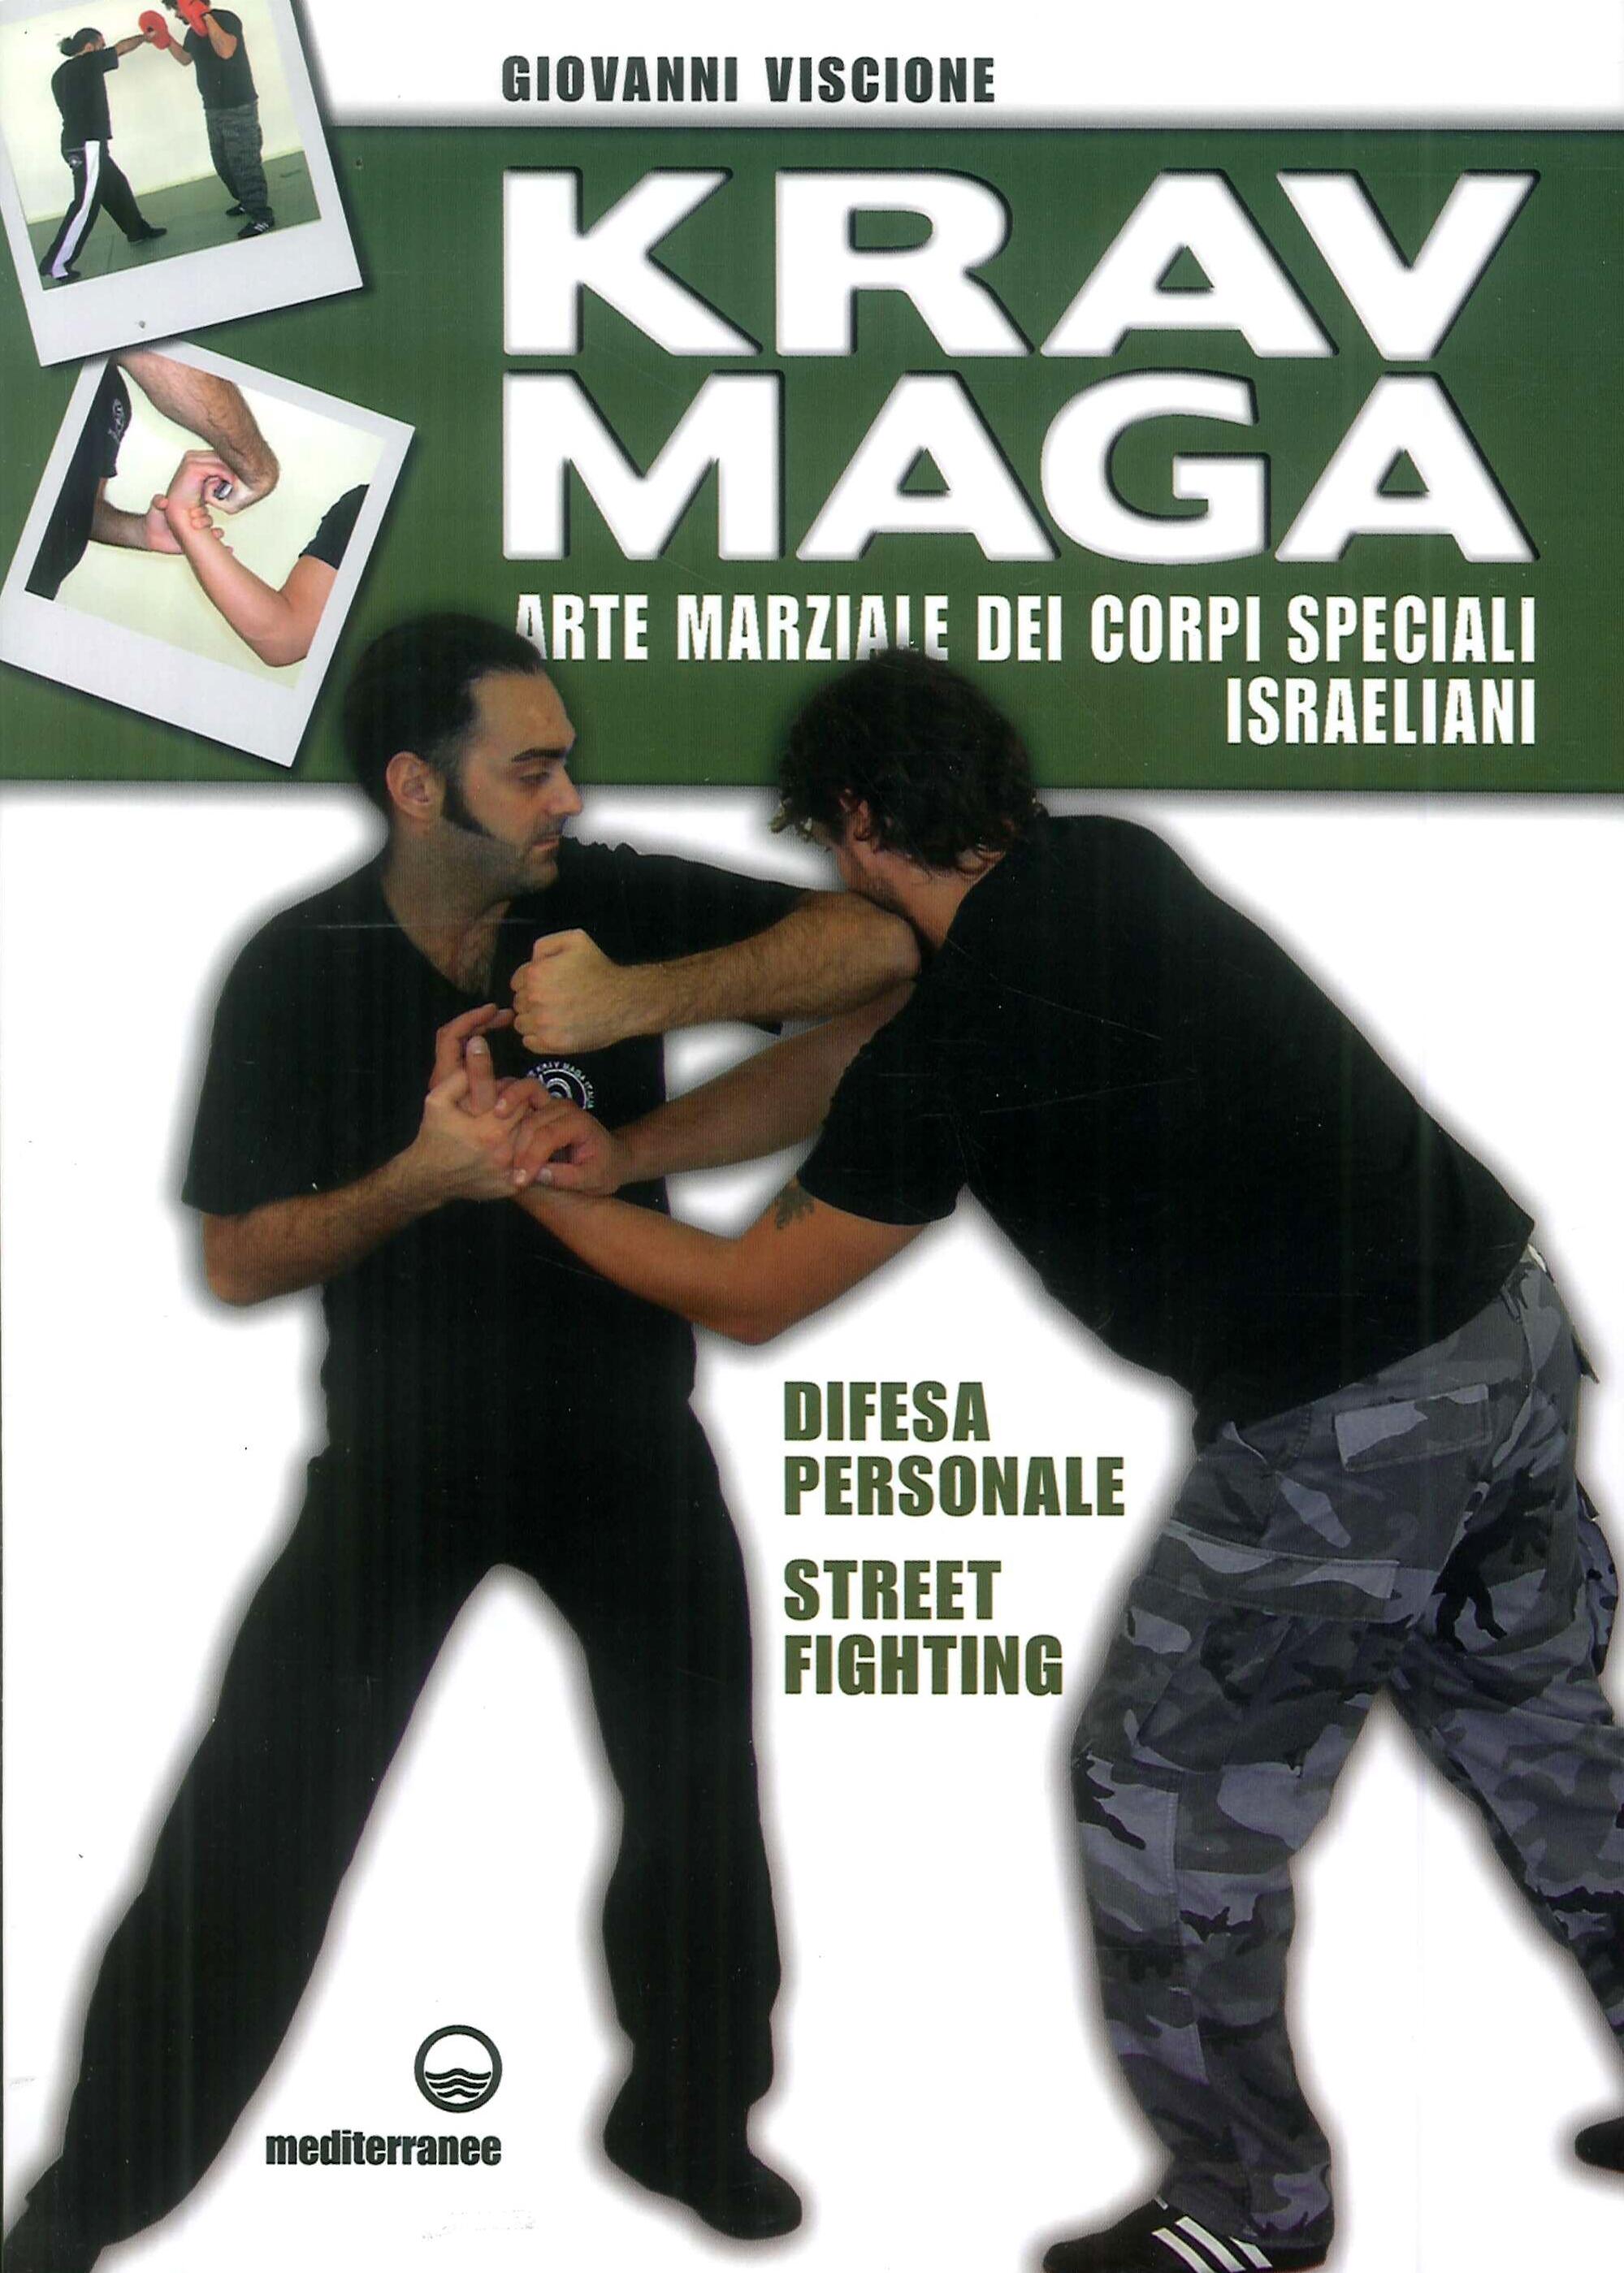 Krav Maga. Arte marziale dei corpi speciali israeliani. Difesa personale, street fighting.